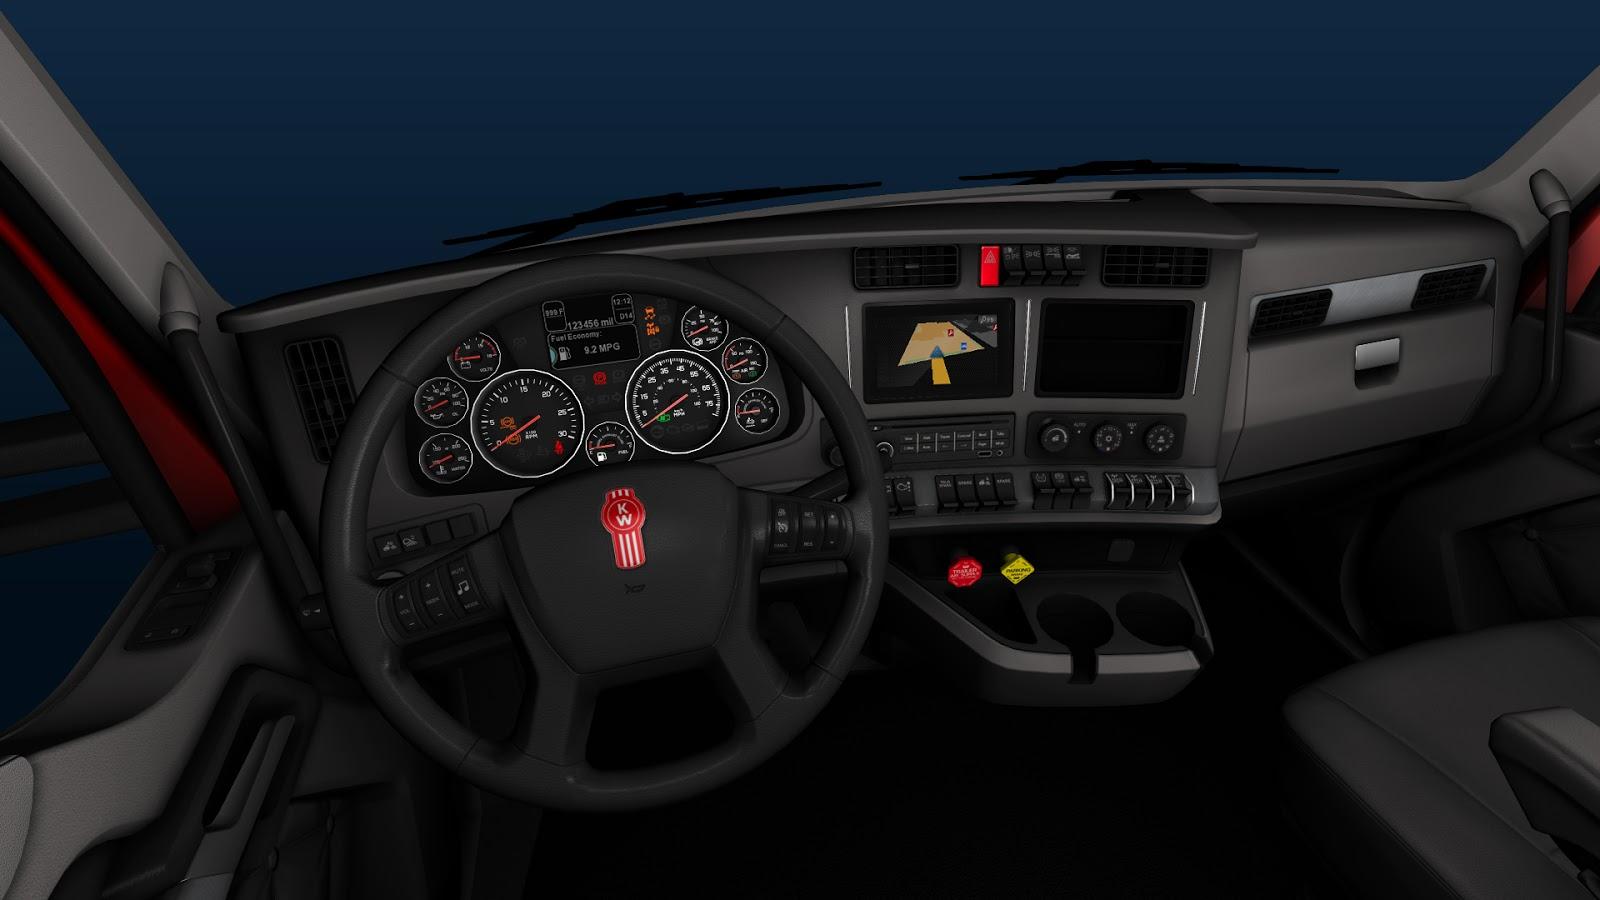 Kenworth t680 truck interior in american truck simulator for Interiores 2016